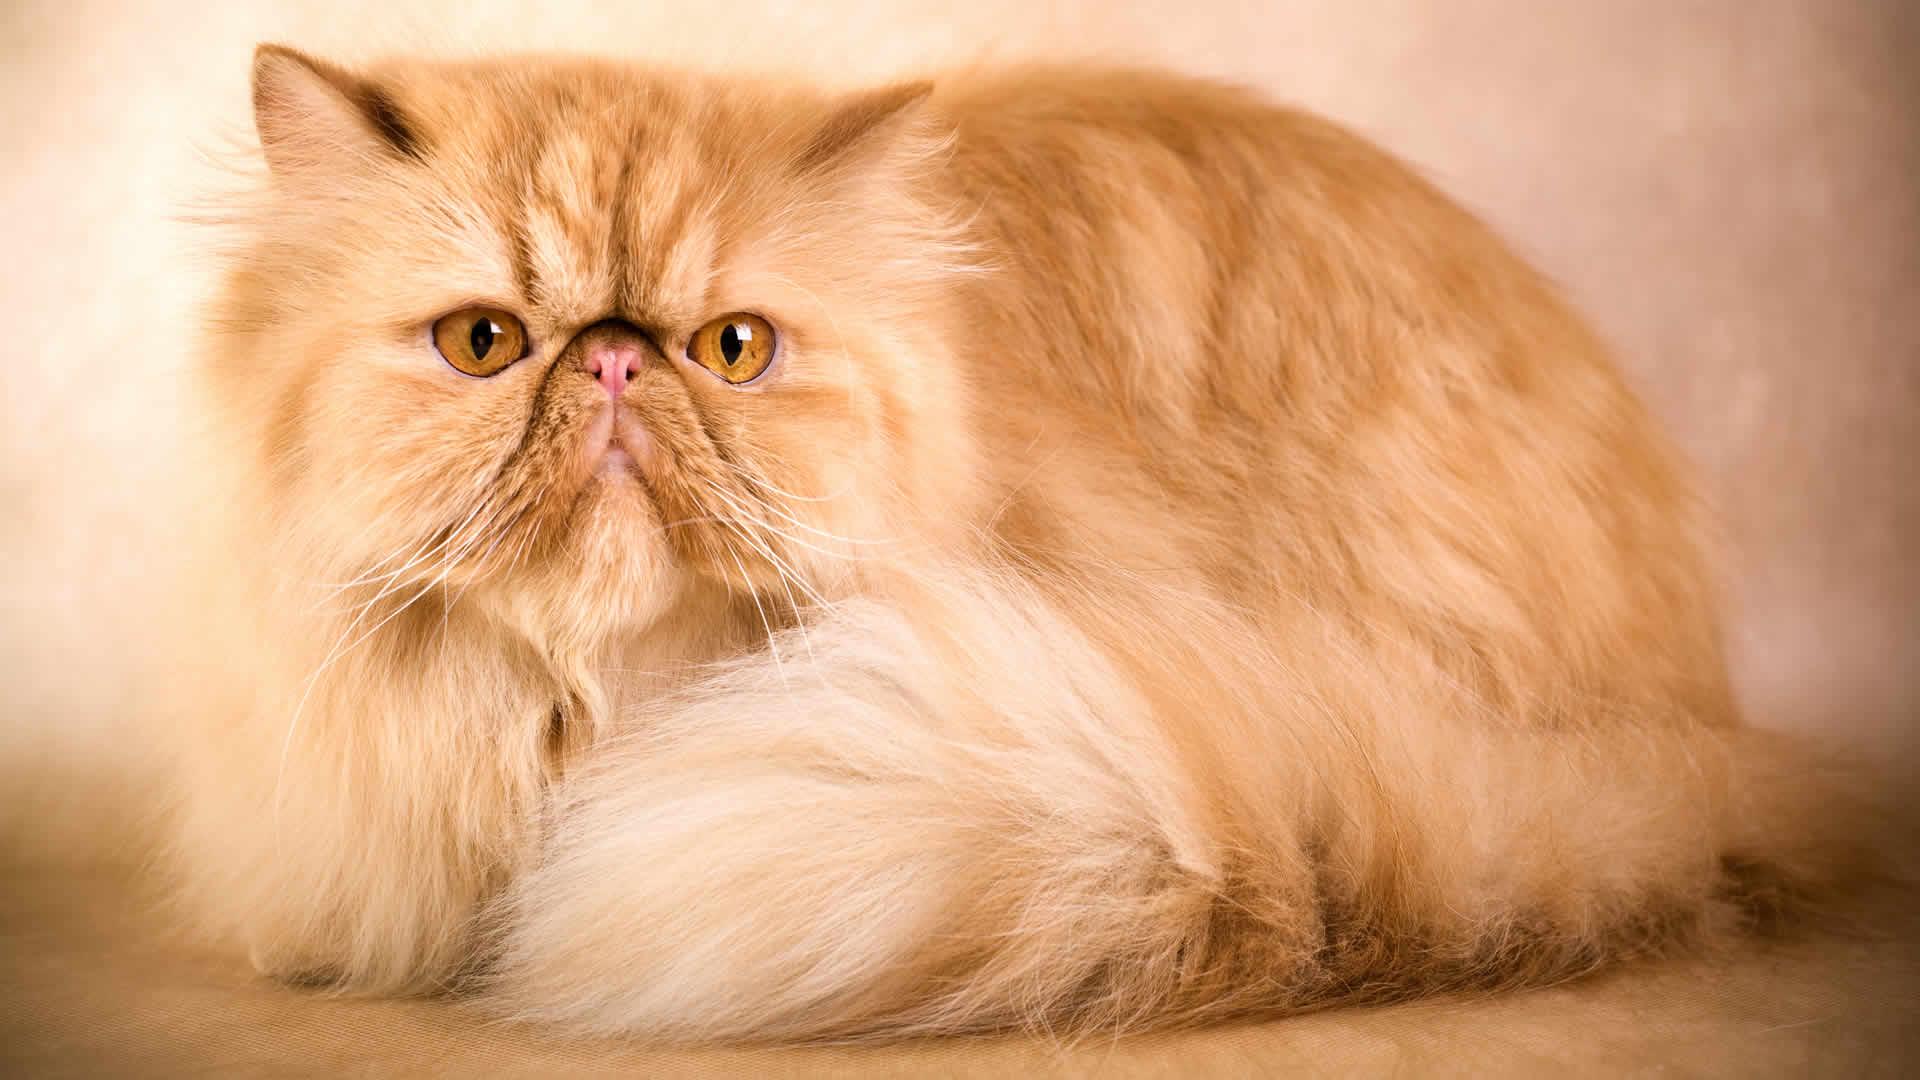 Peke-faced Persian